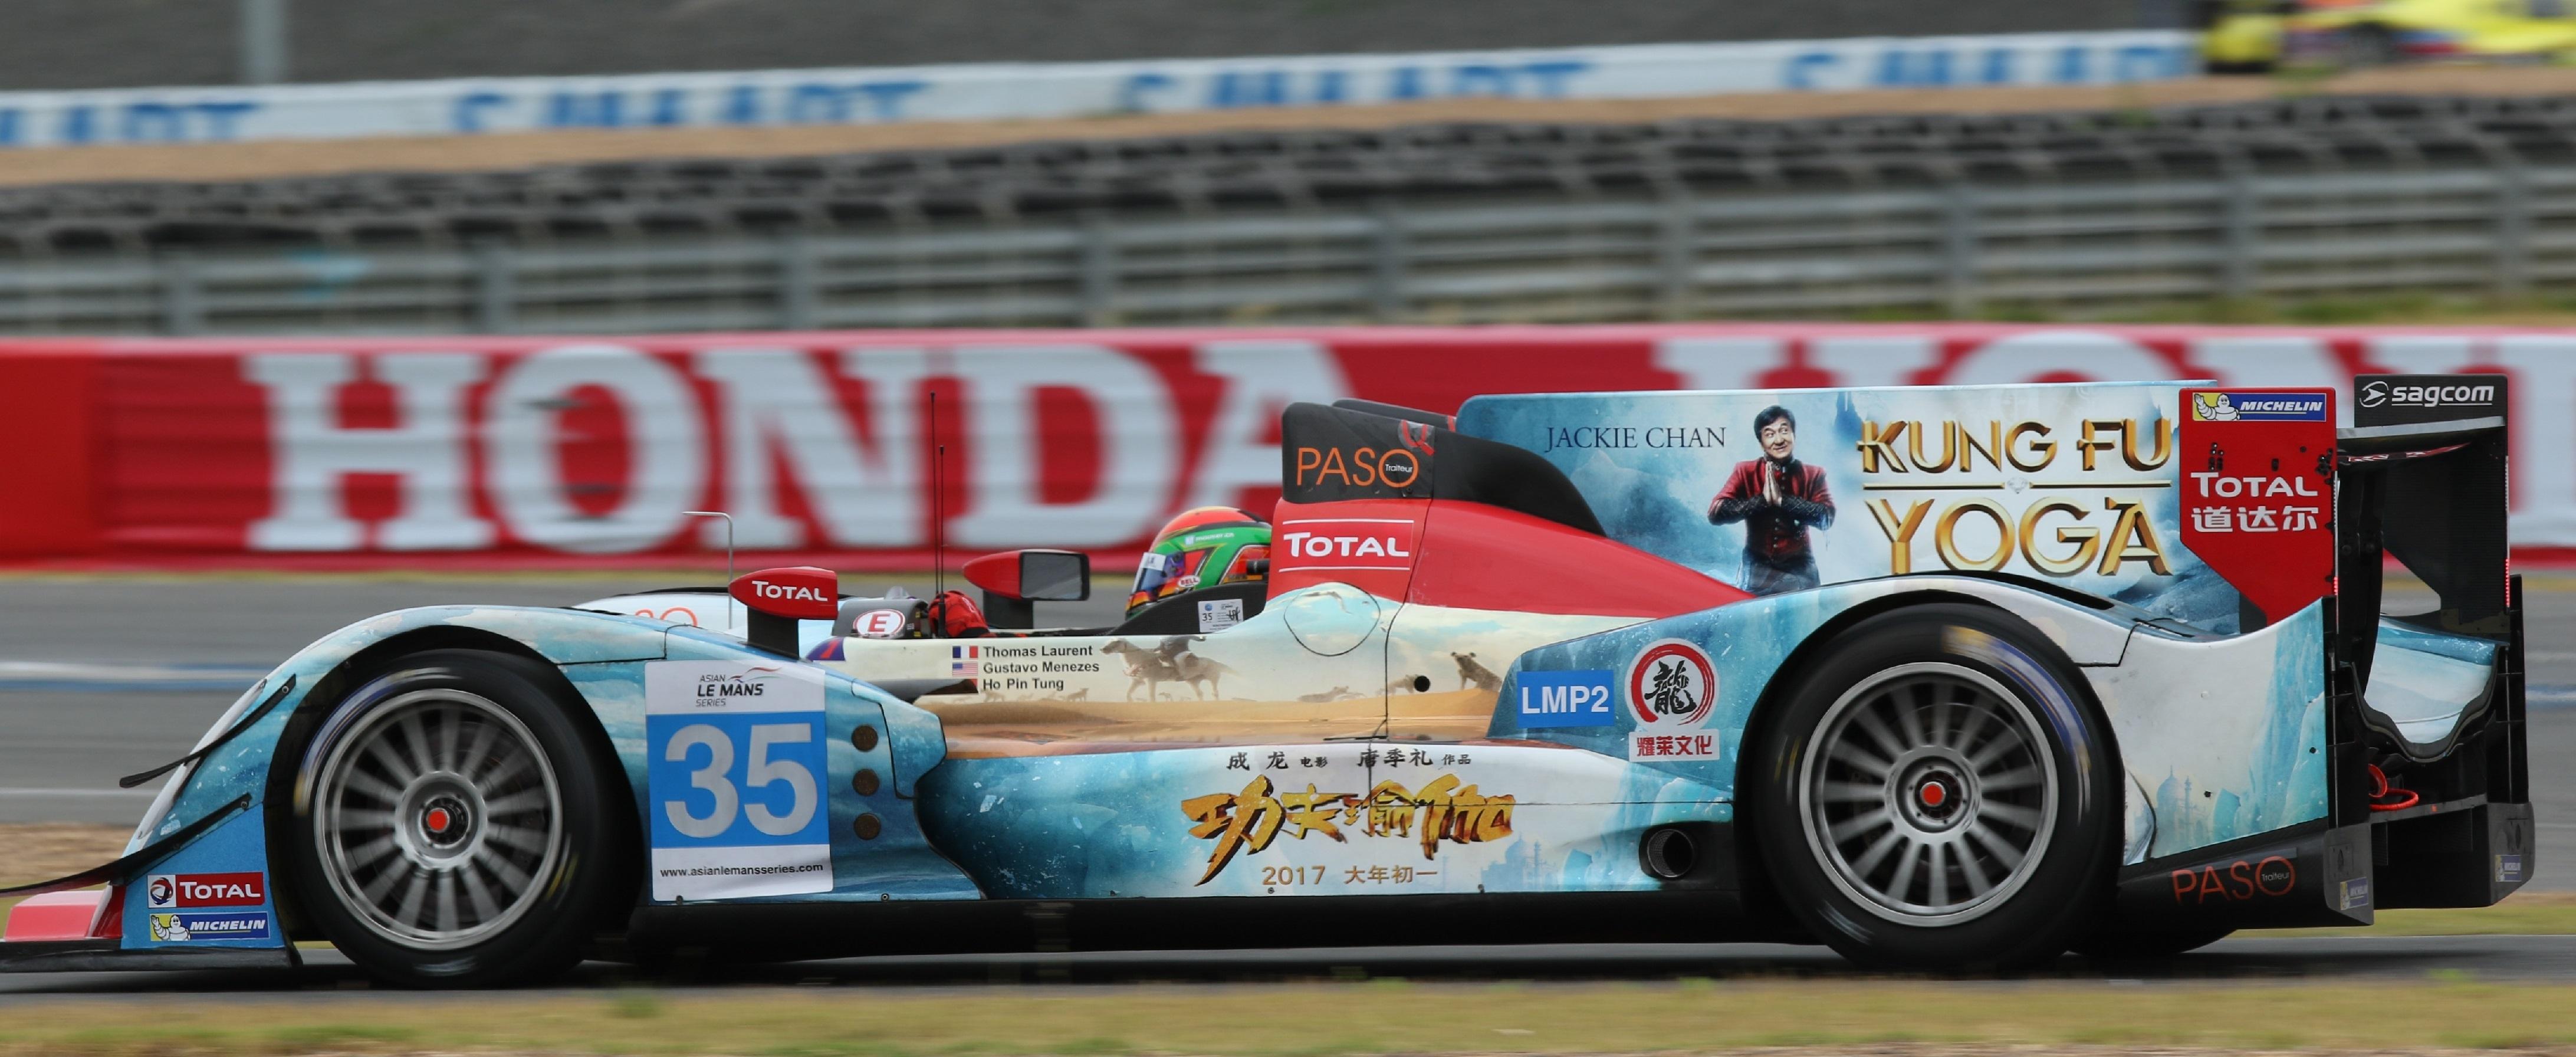 Jackie Chan DC Racing Buriram 2017 Asian Le Mans Series